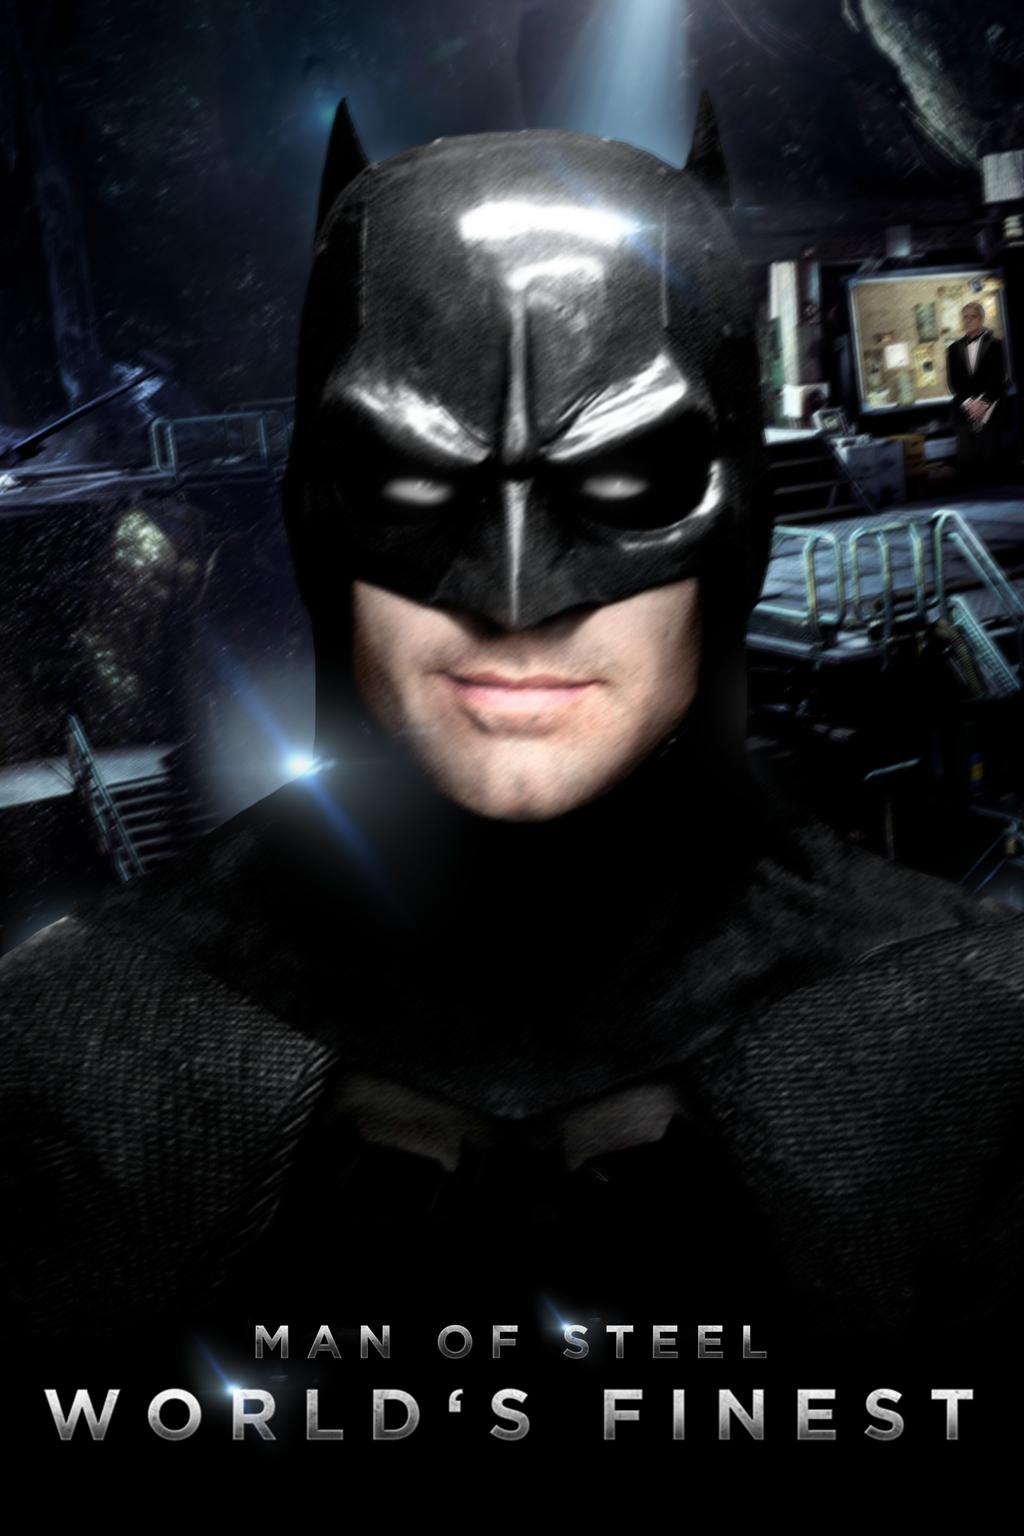 MAN OF STEEL: WORLD'S FINEST - BATMAN - Poster I- by MrSteiners